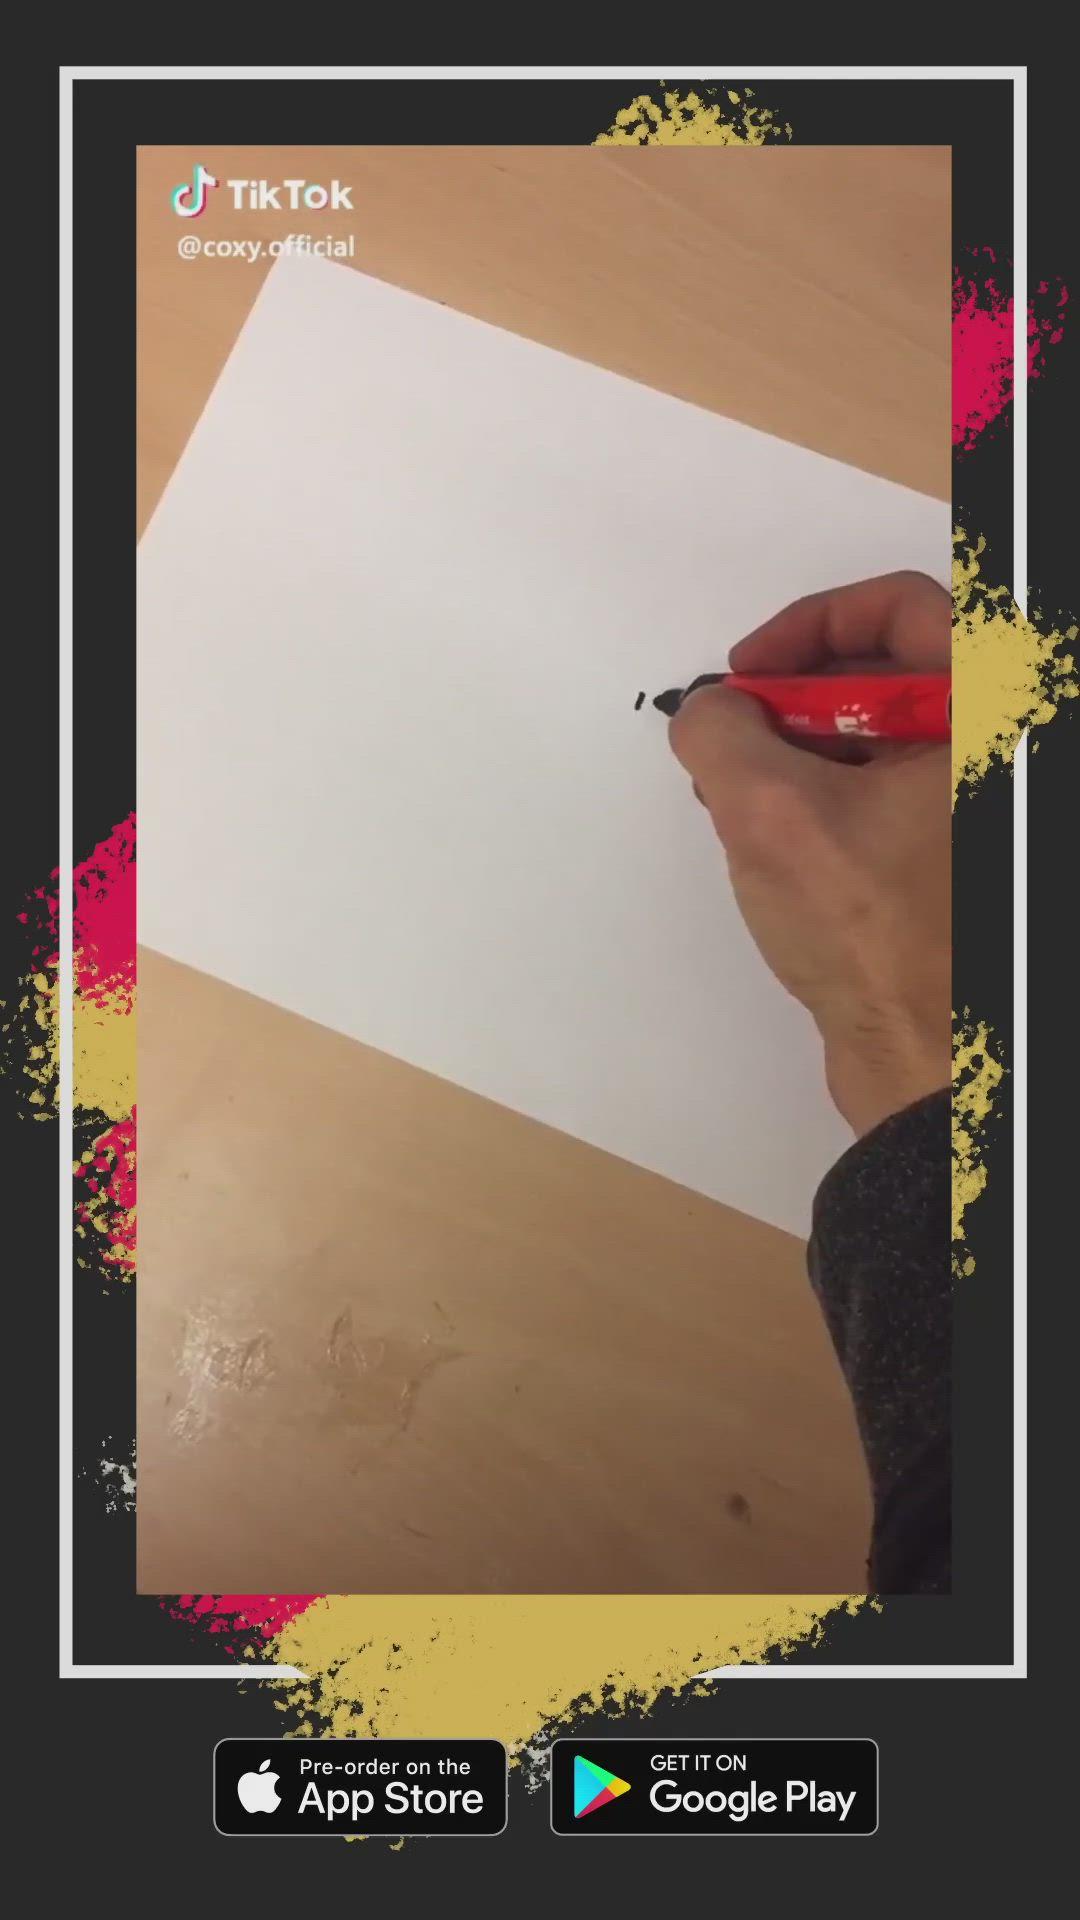 Tiktok Moving Dynamic Art Video Art And Craft Videos Memes Oddly Satisfying Videos